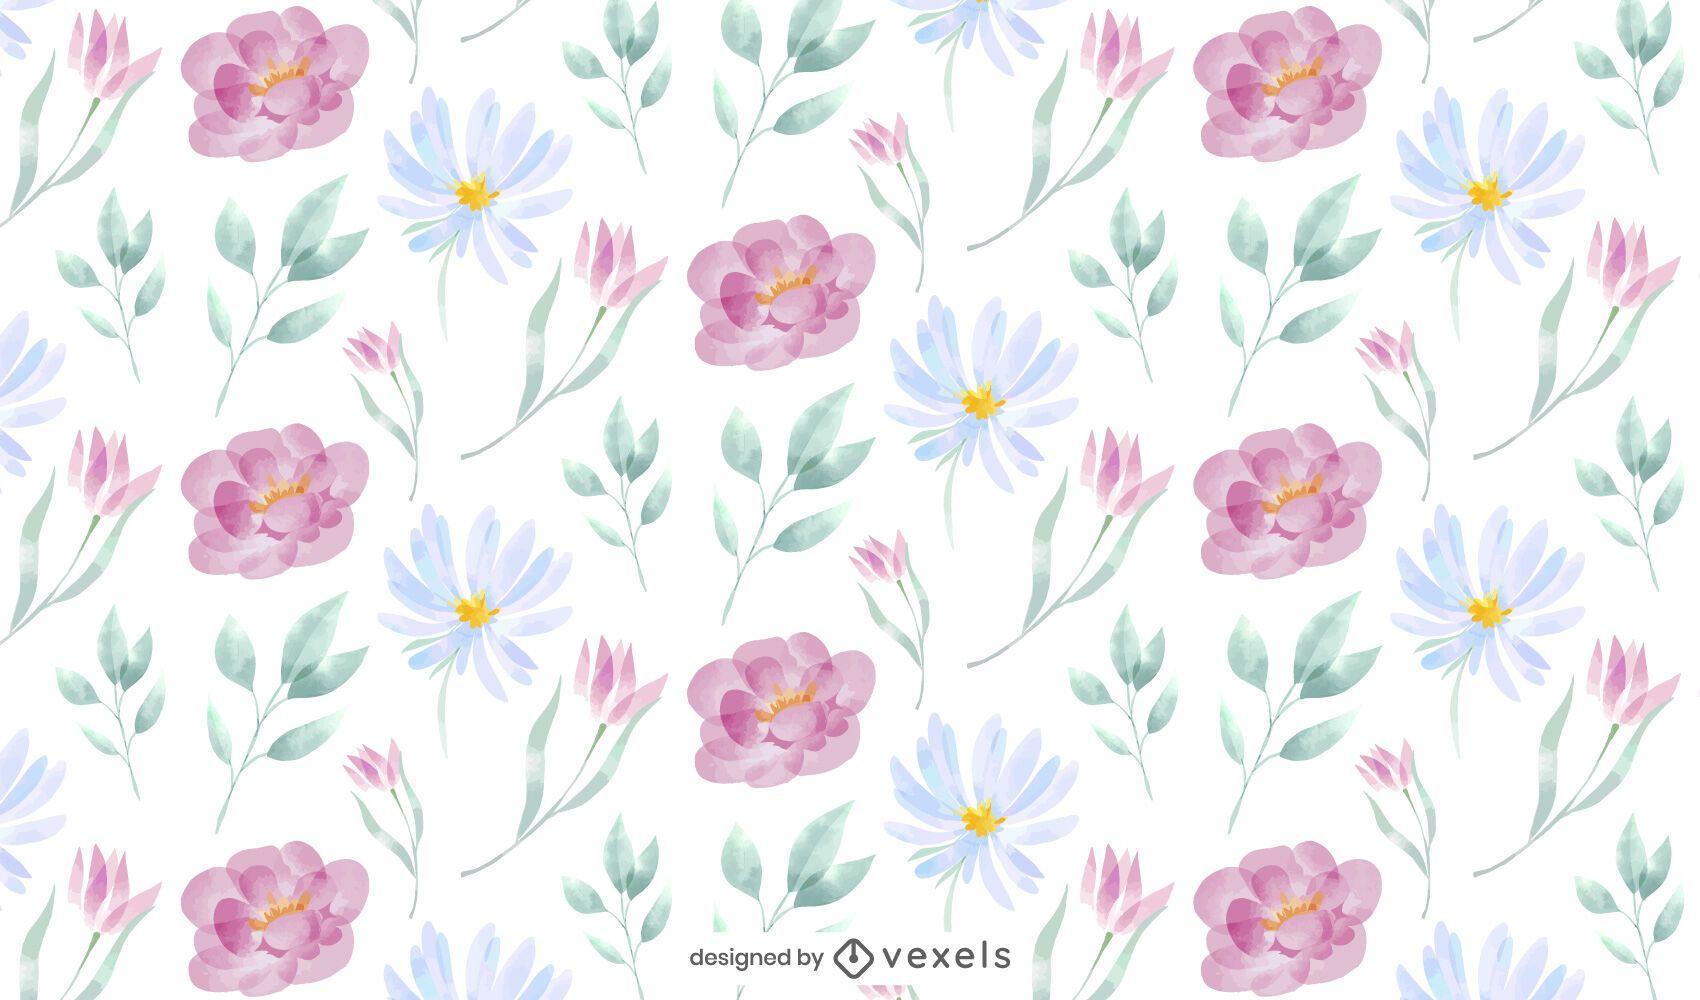 Watercolor flower nature pattern design